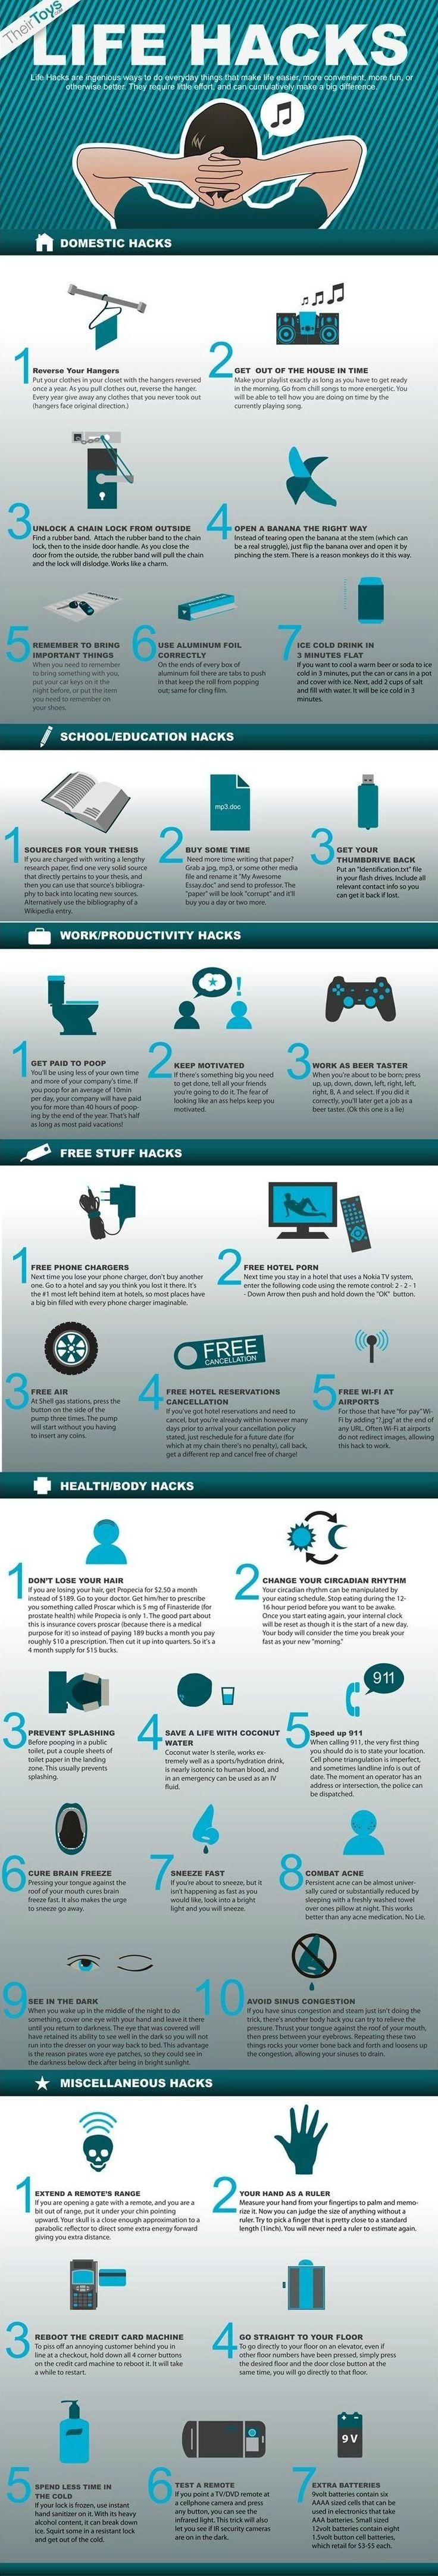 Universal Life Hacks - Domestic, Productivity, Health, Free Stuff (Infographic) - Karma Jello